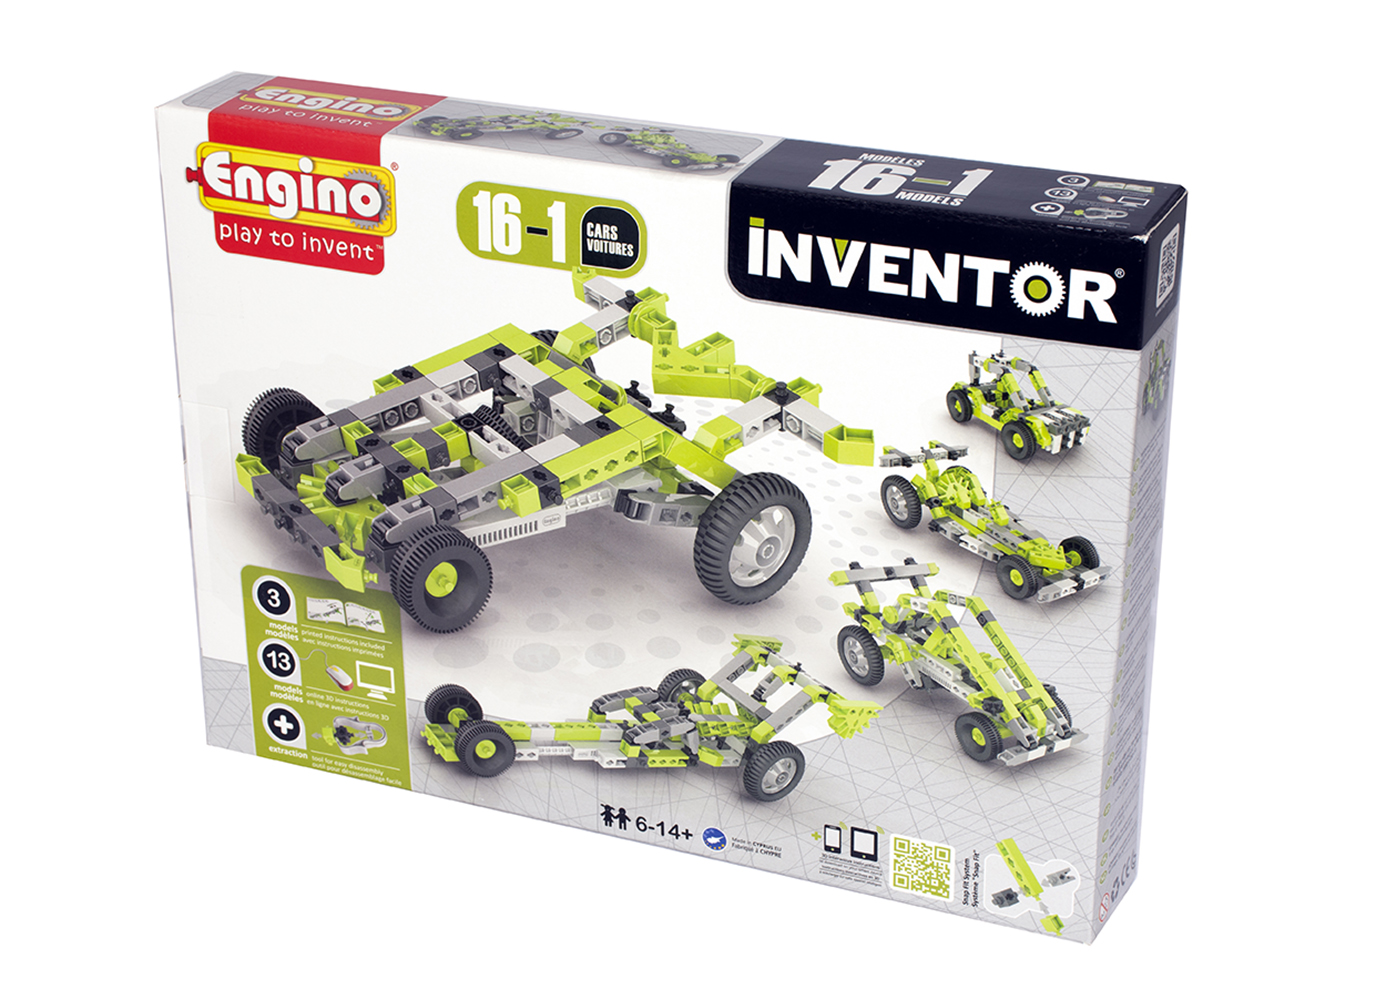 Inventor16 Modèles Voitures